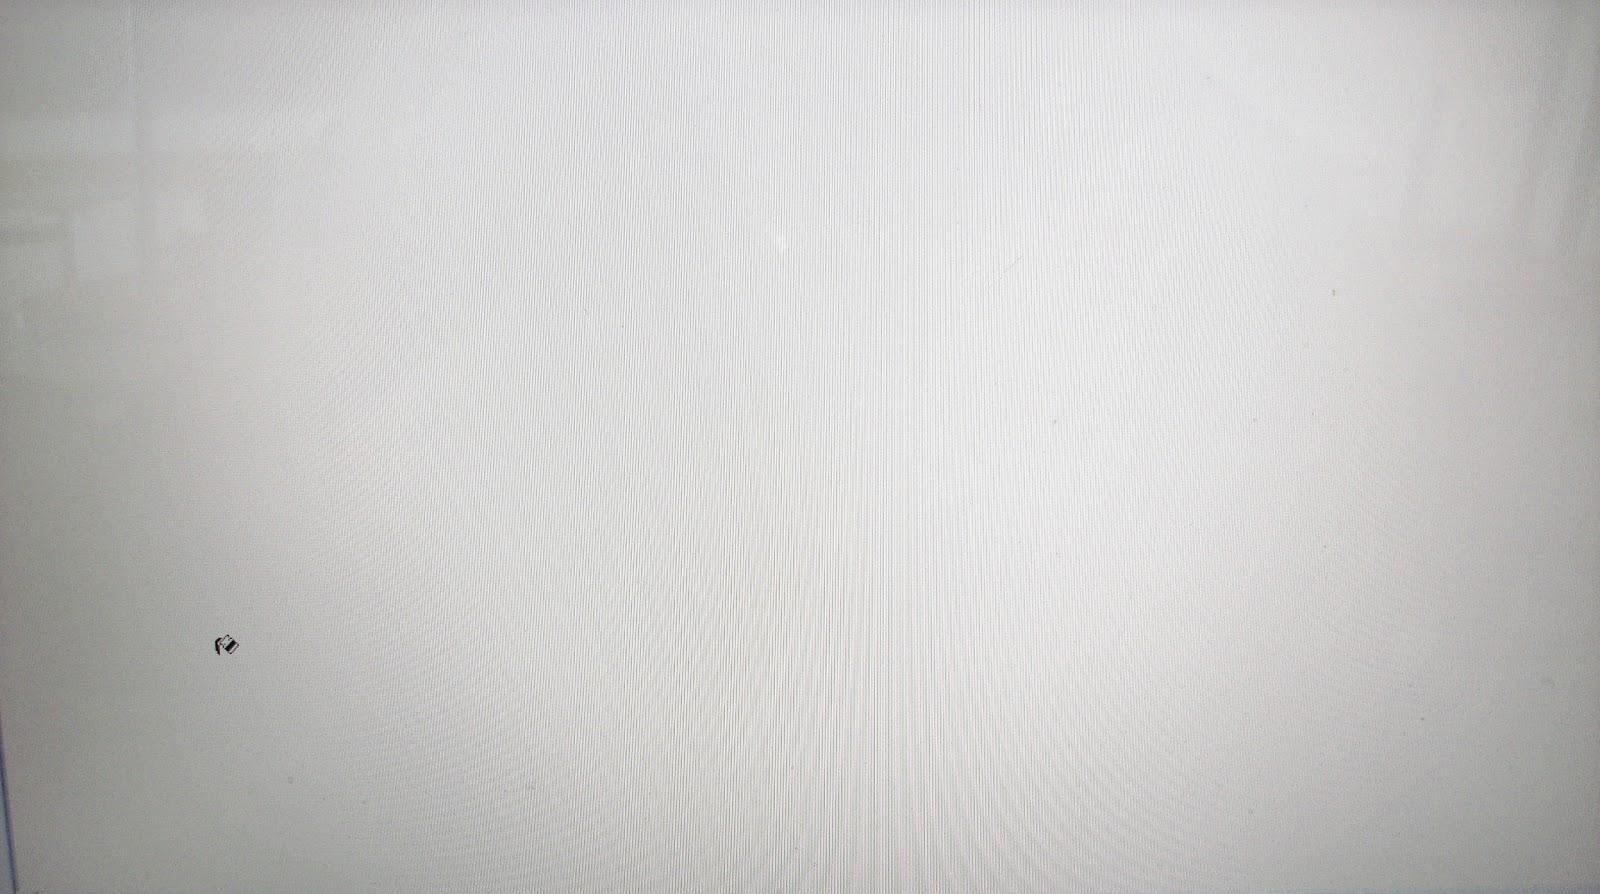 Background White Gallery: สิงหาคม 2013